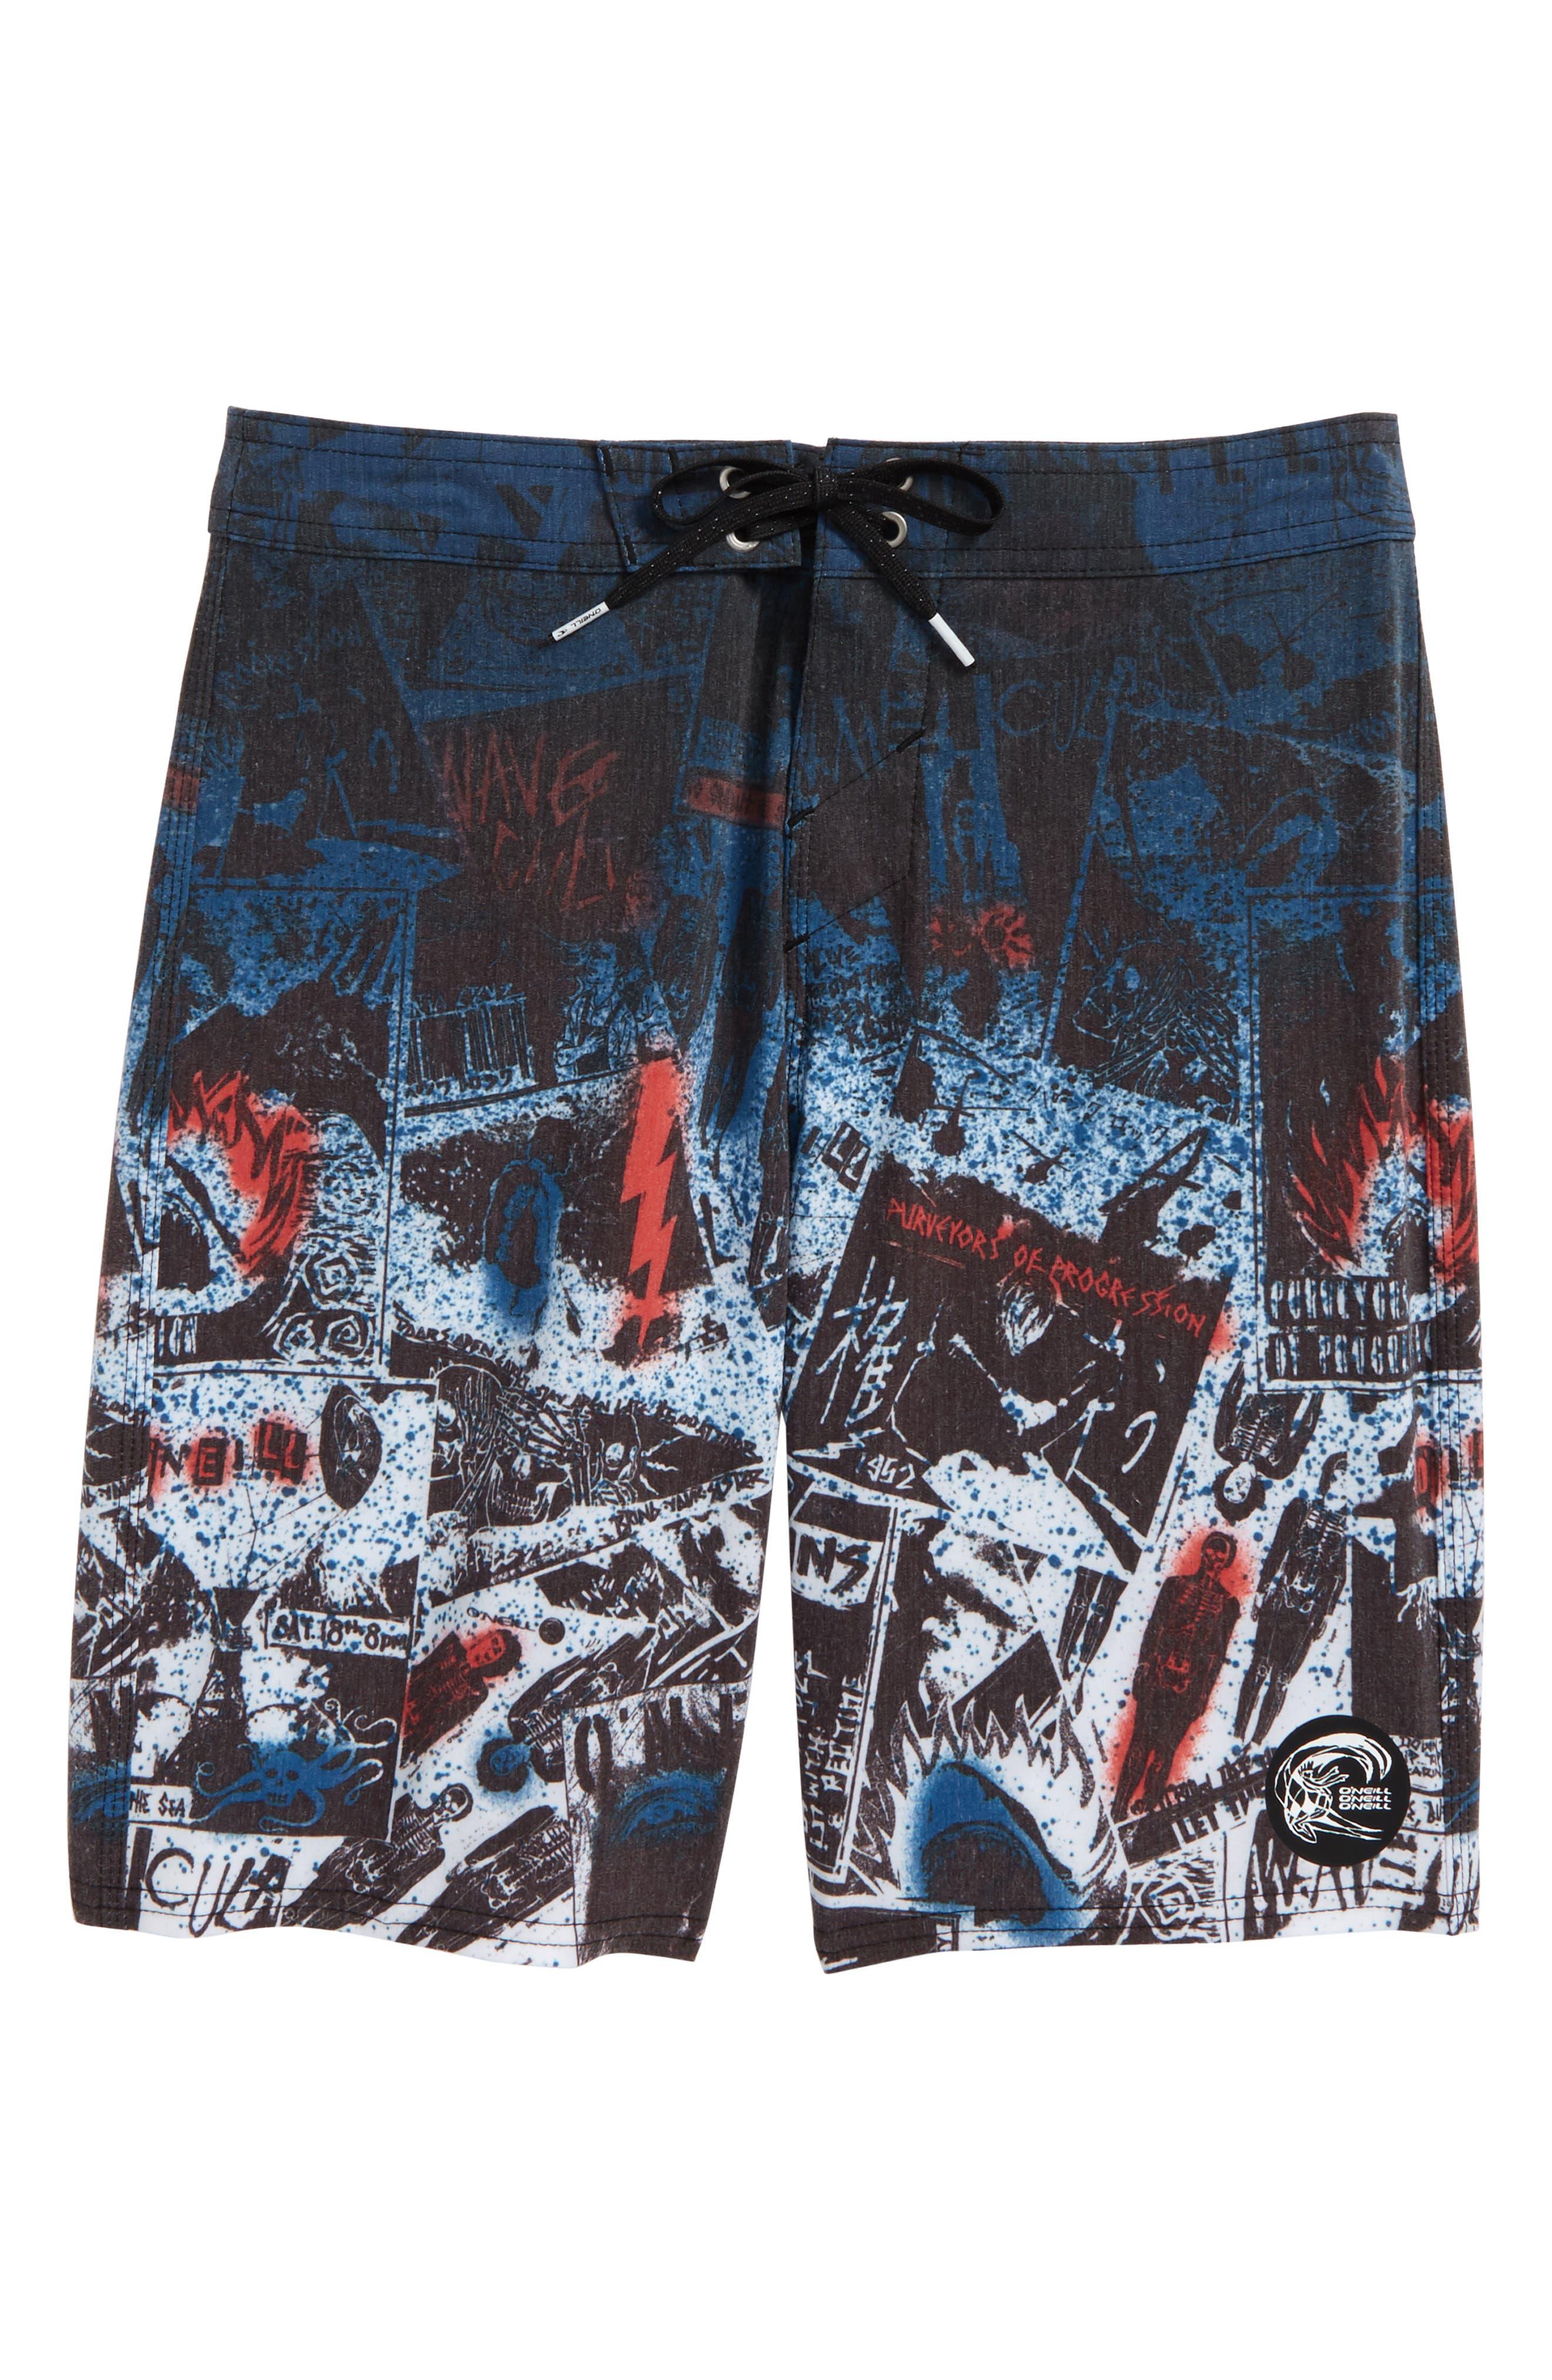 Hyperfreak Americore Board Shorts,                             Main thumbnail 1, color,                             001